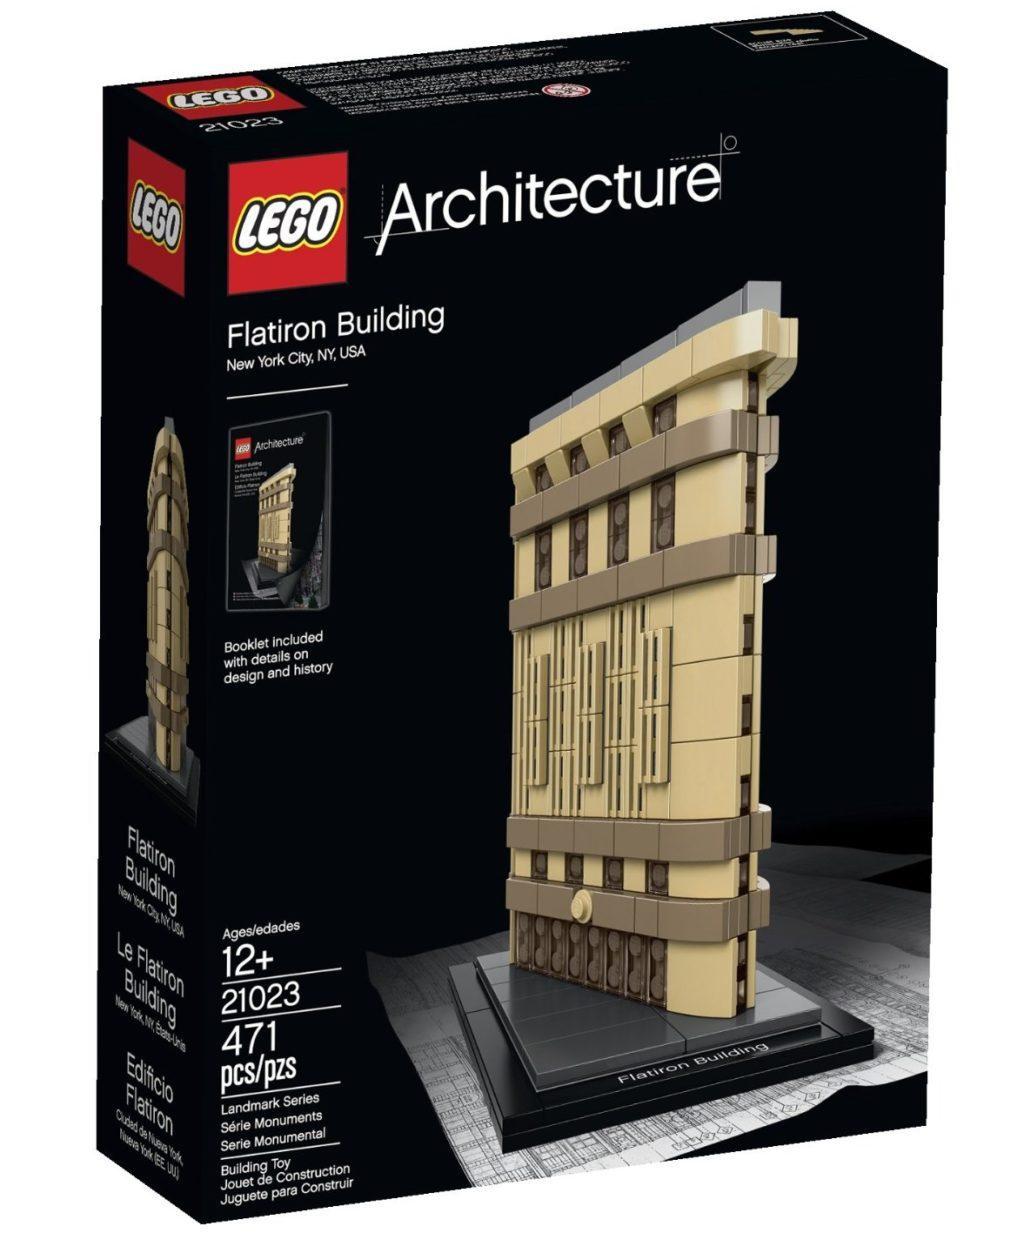 Lego Architecture Flatiron Building e1486990532436